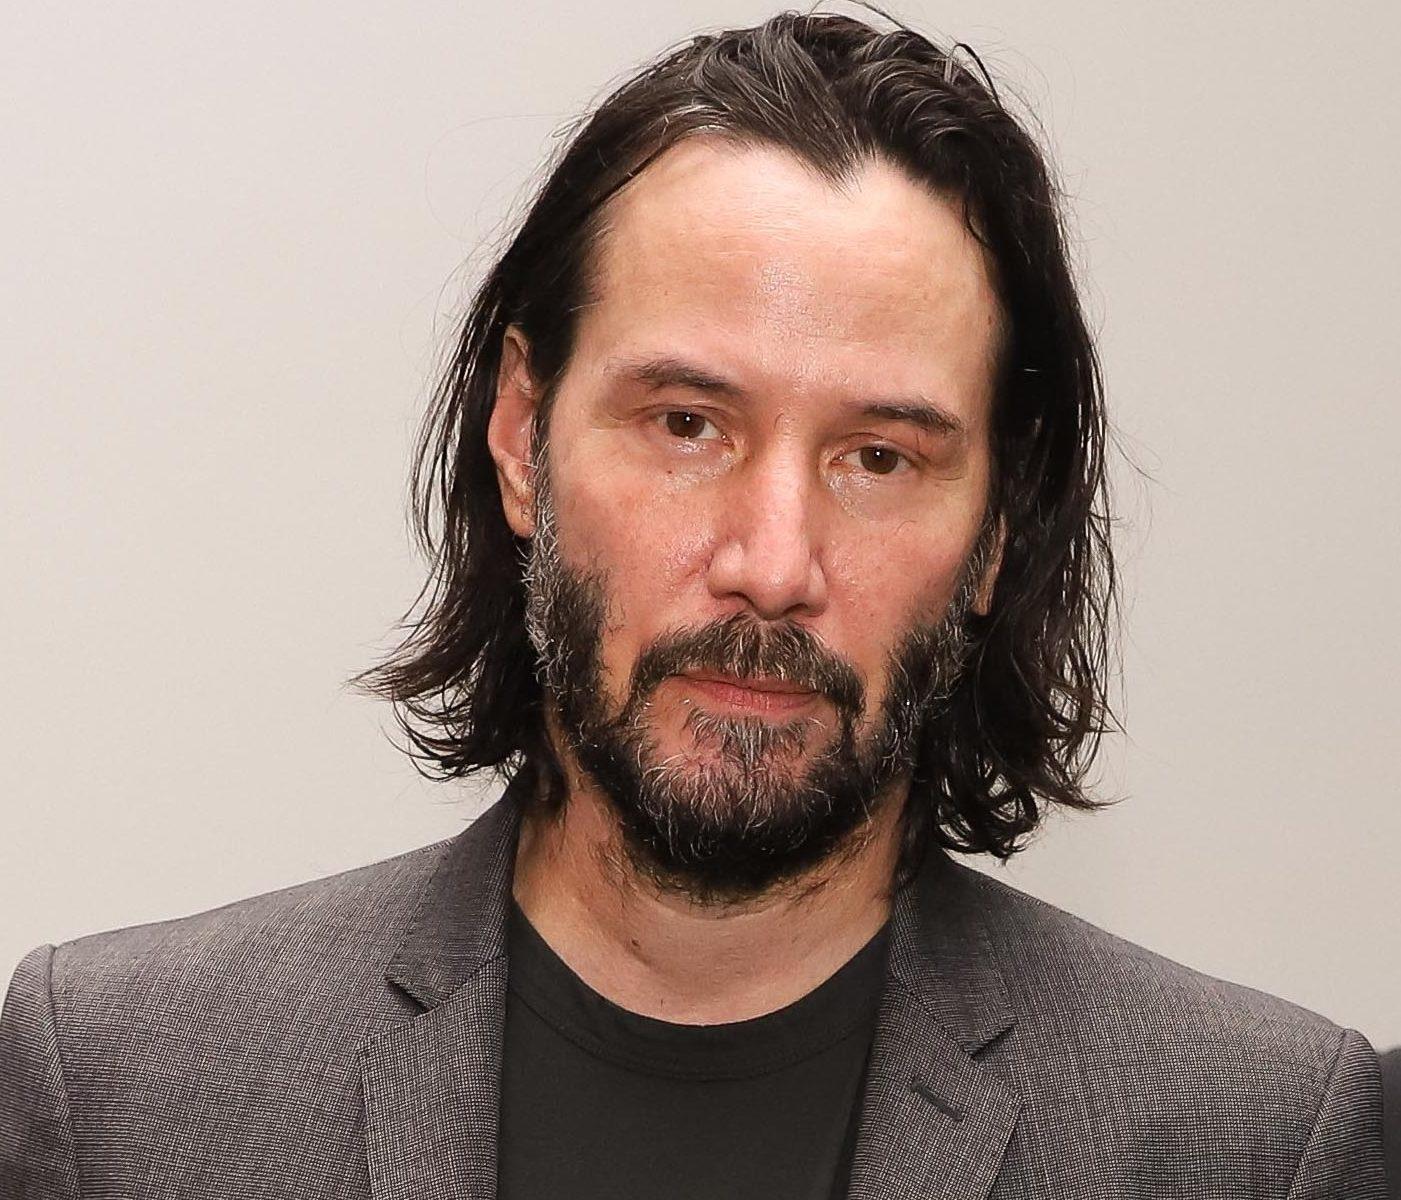 Reunião com o ator norte americano Keanu Reeves cropped e1622111678147 20 Things You Never Knew About Keanu Reeves